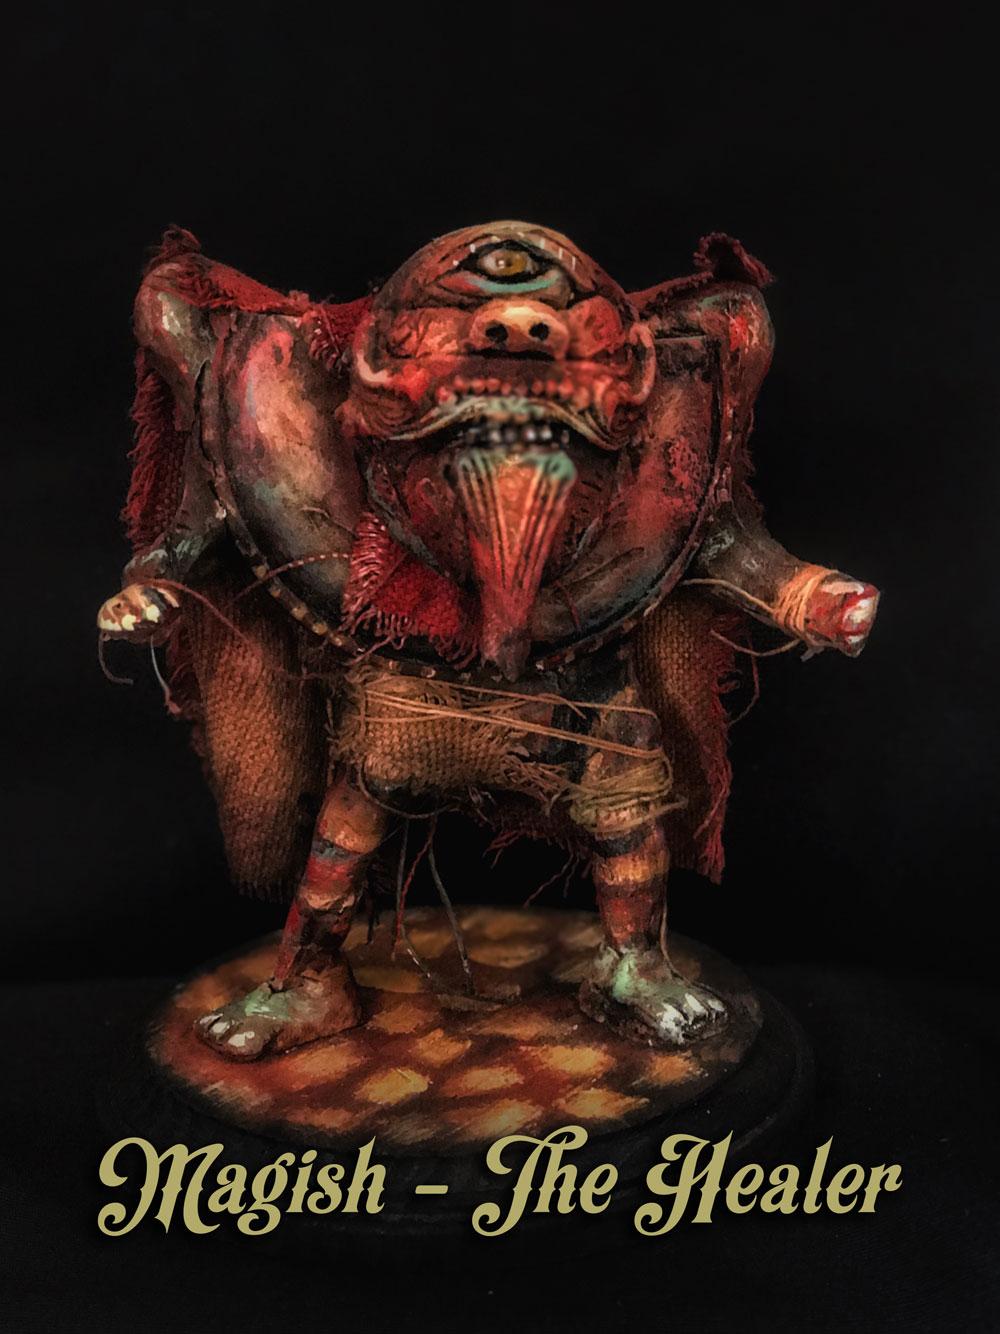 Magish - the Healer